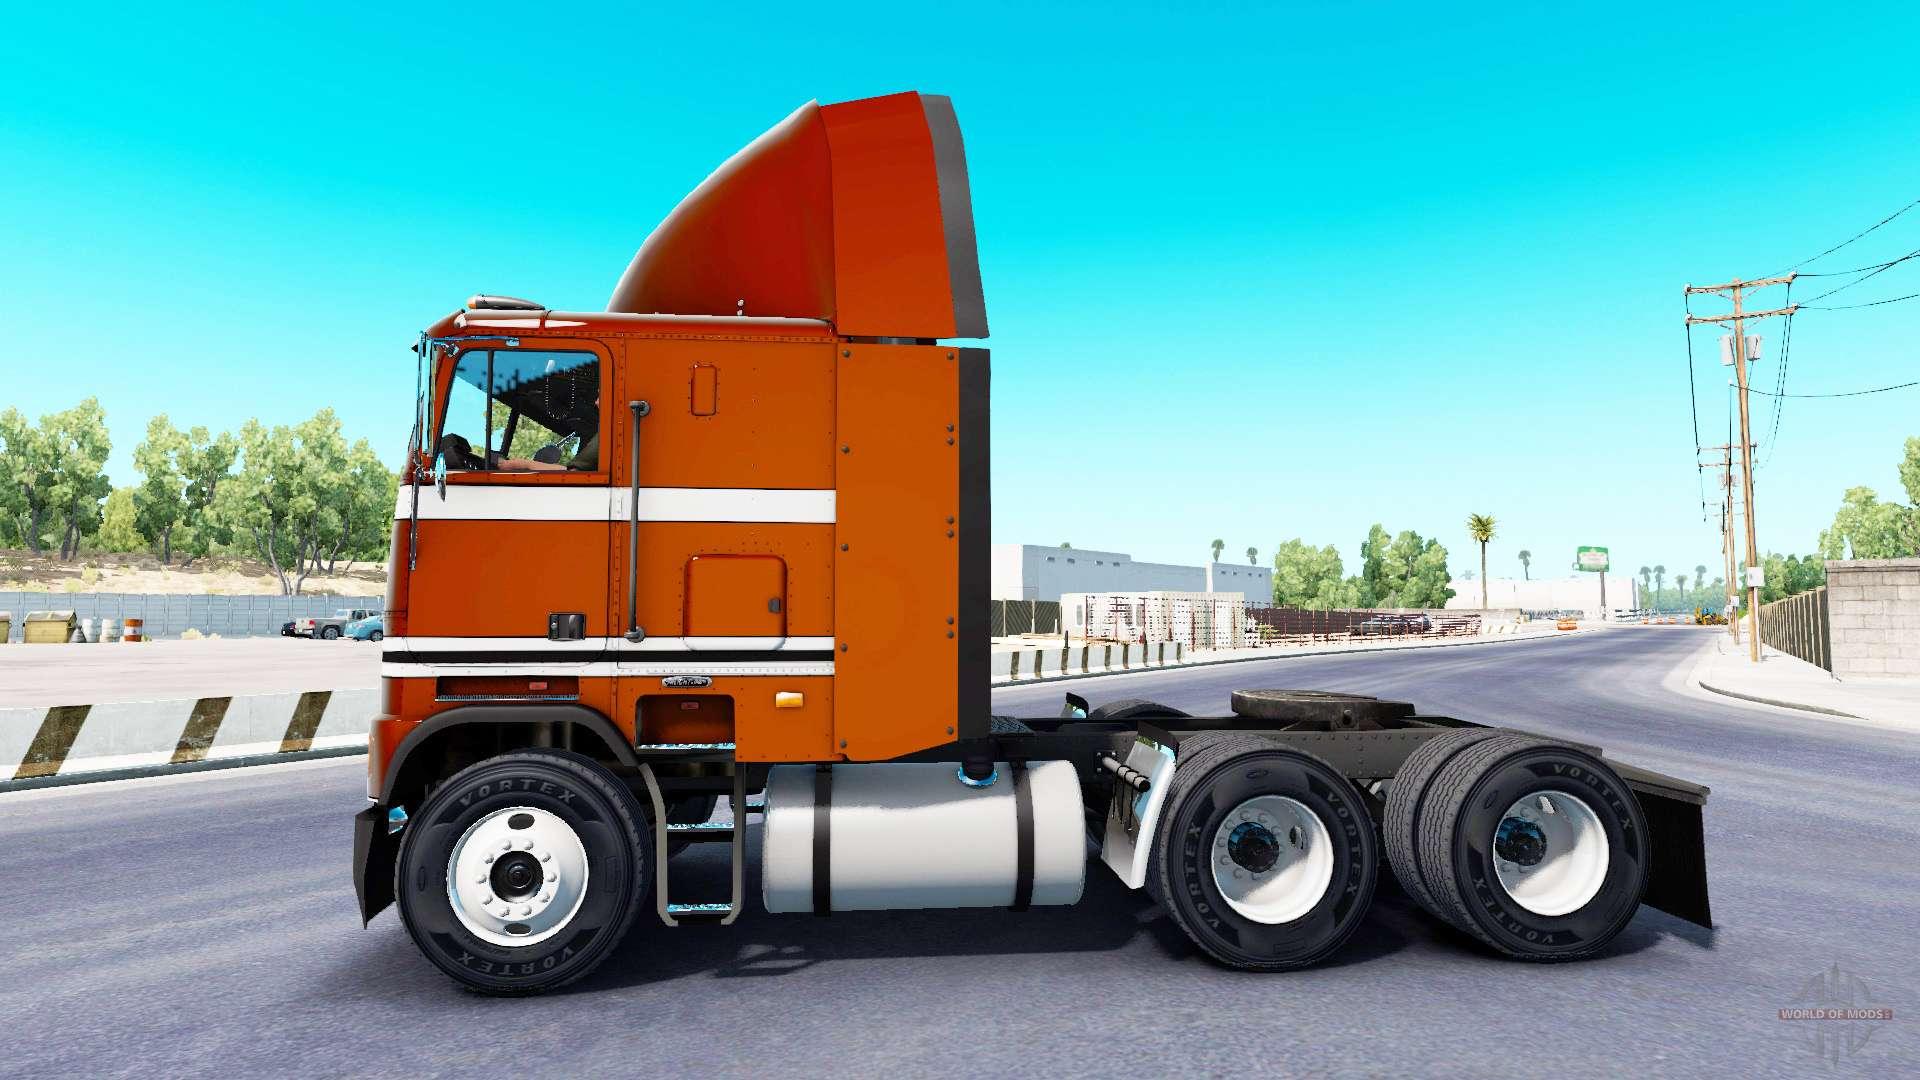 Freightliner Flb Ats